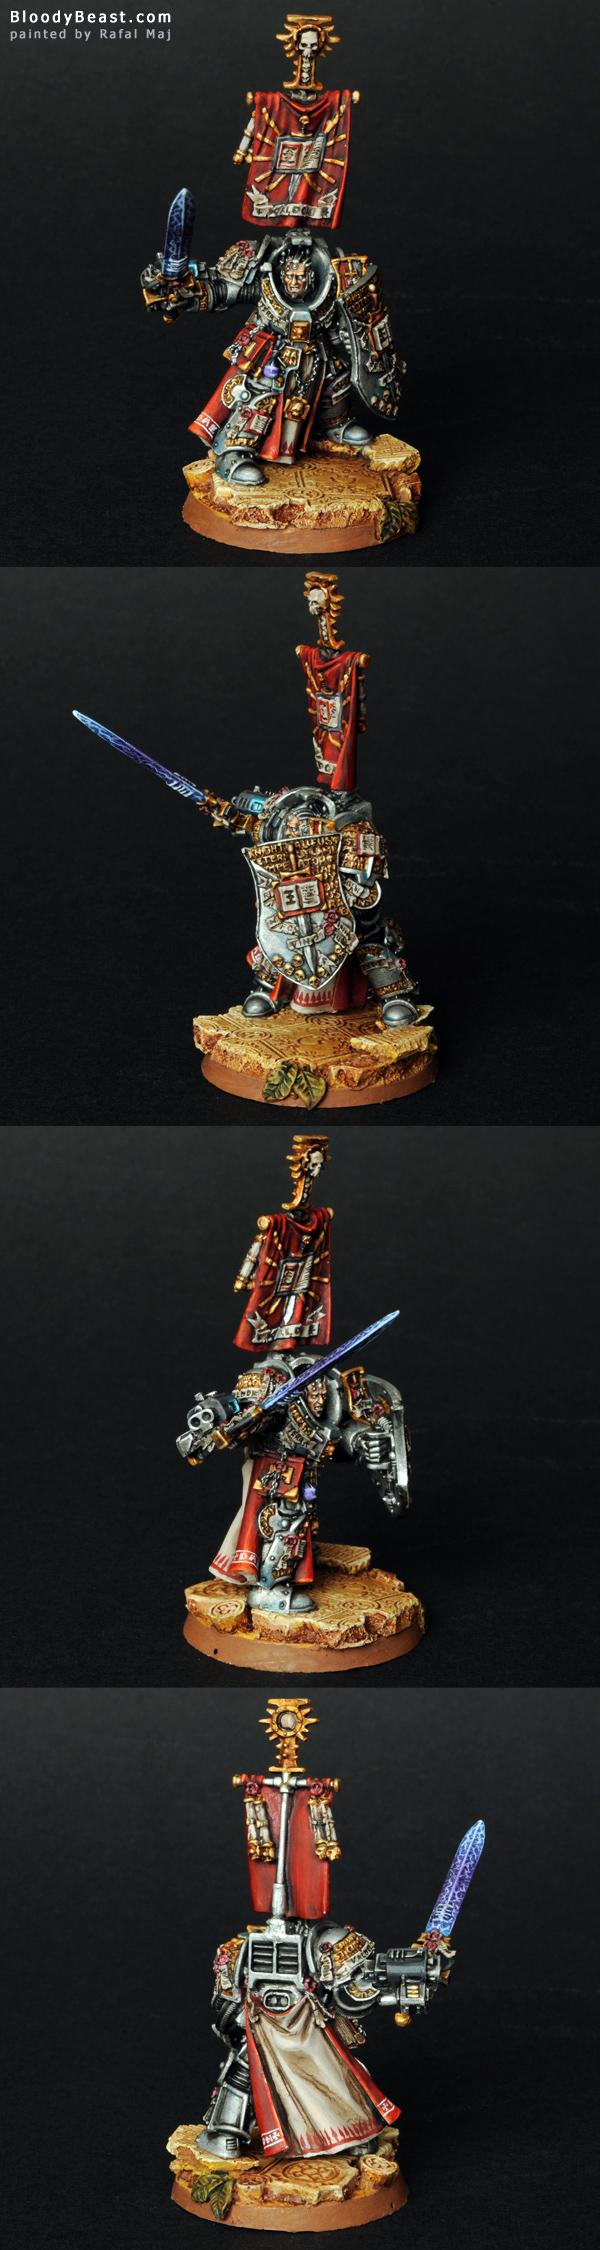 Lord Kaldor Draigo painted by Rafal Maj (BloodyBeast.com)